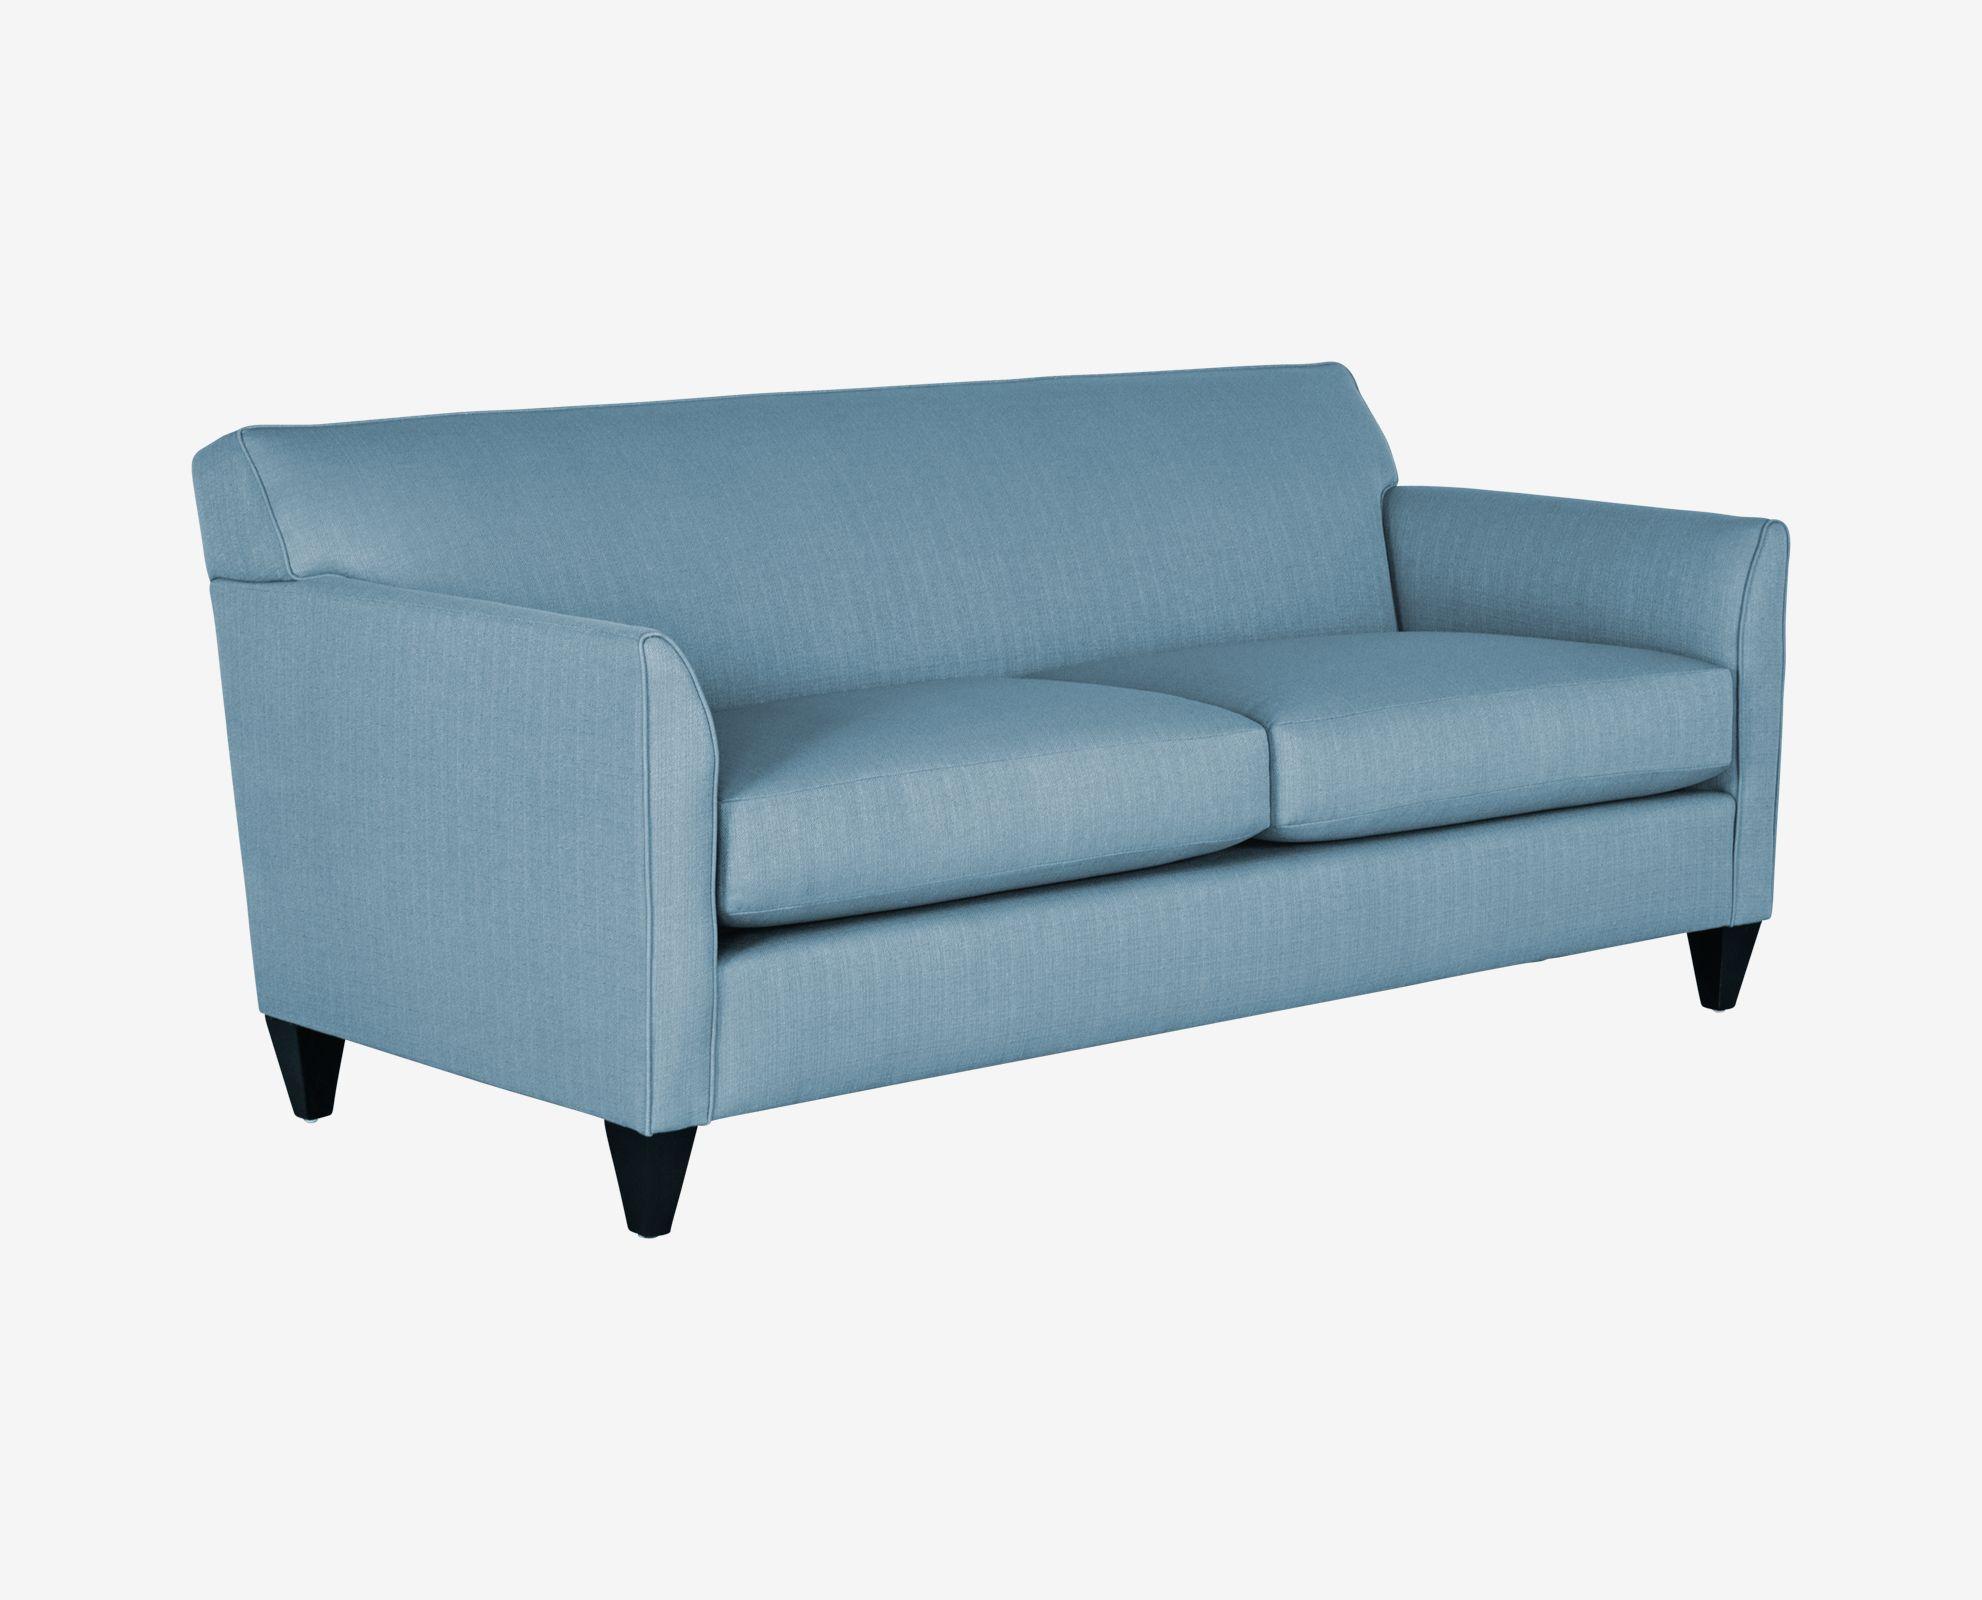 furniture manhattan products black chair ekornes dania stol chairs